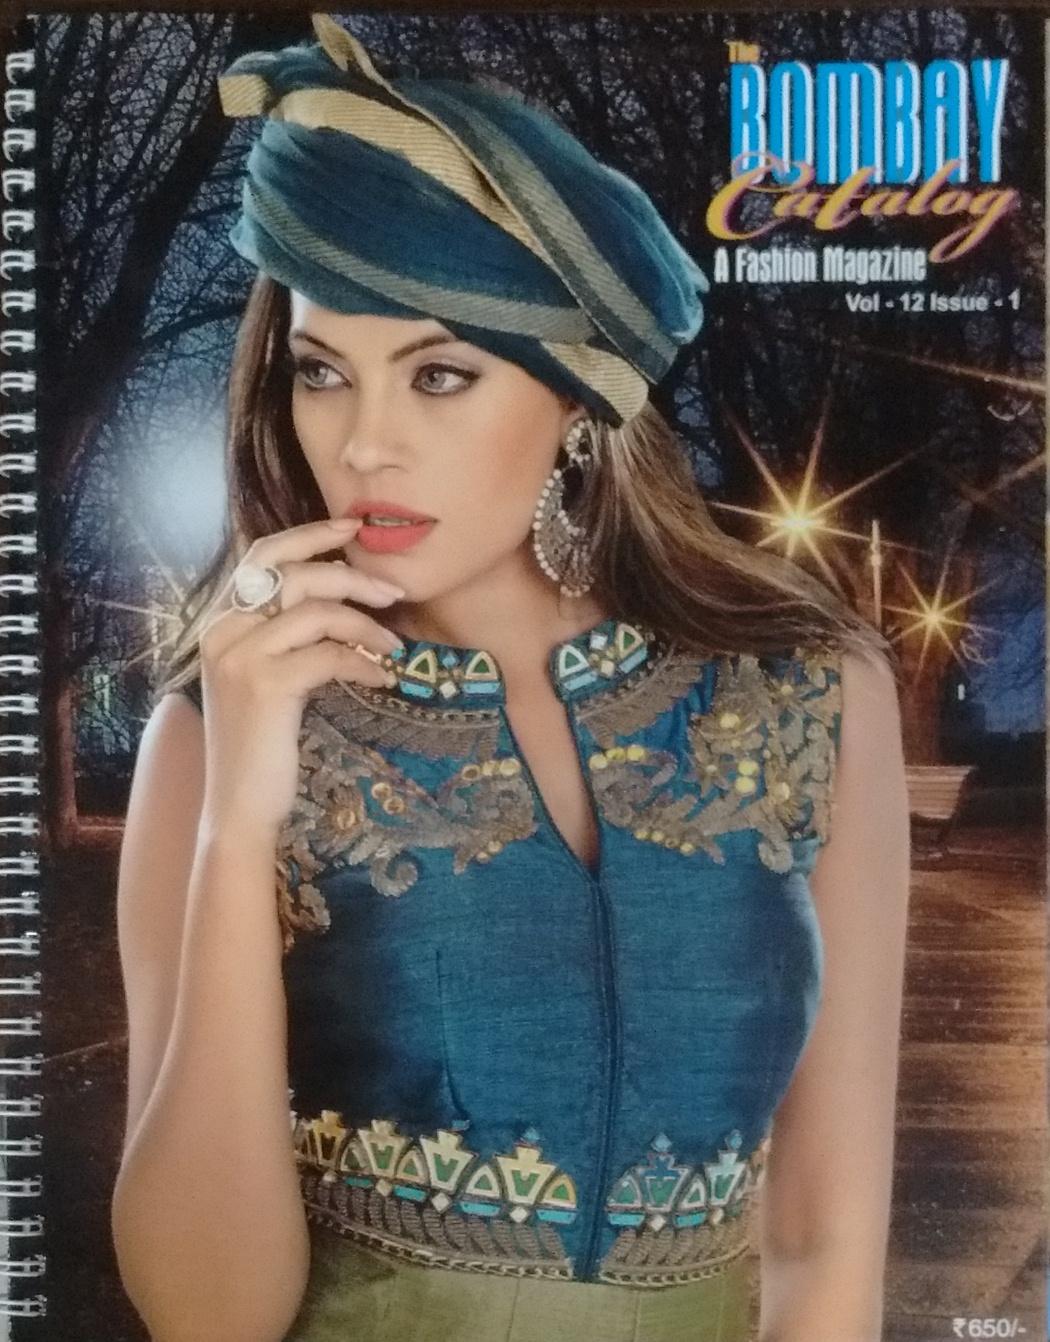 The Bombay Catalog: A Fashion Magazine Vol. 12 Iss…